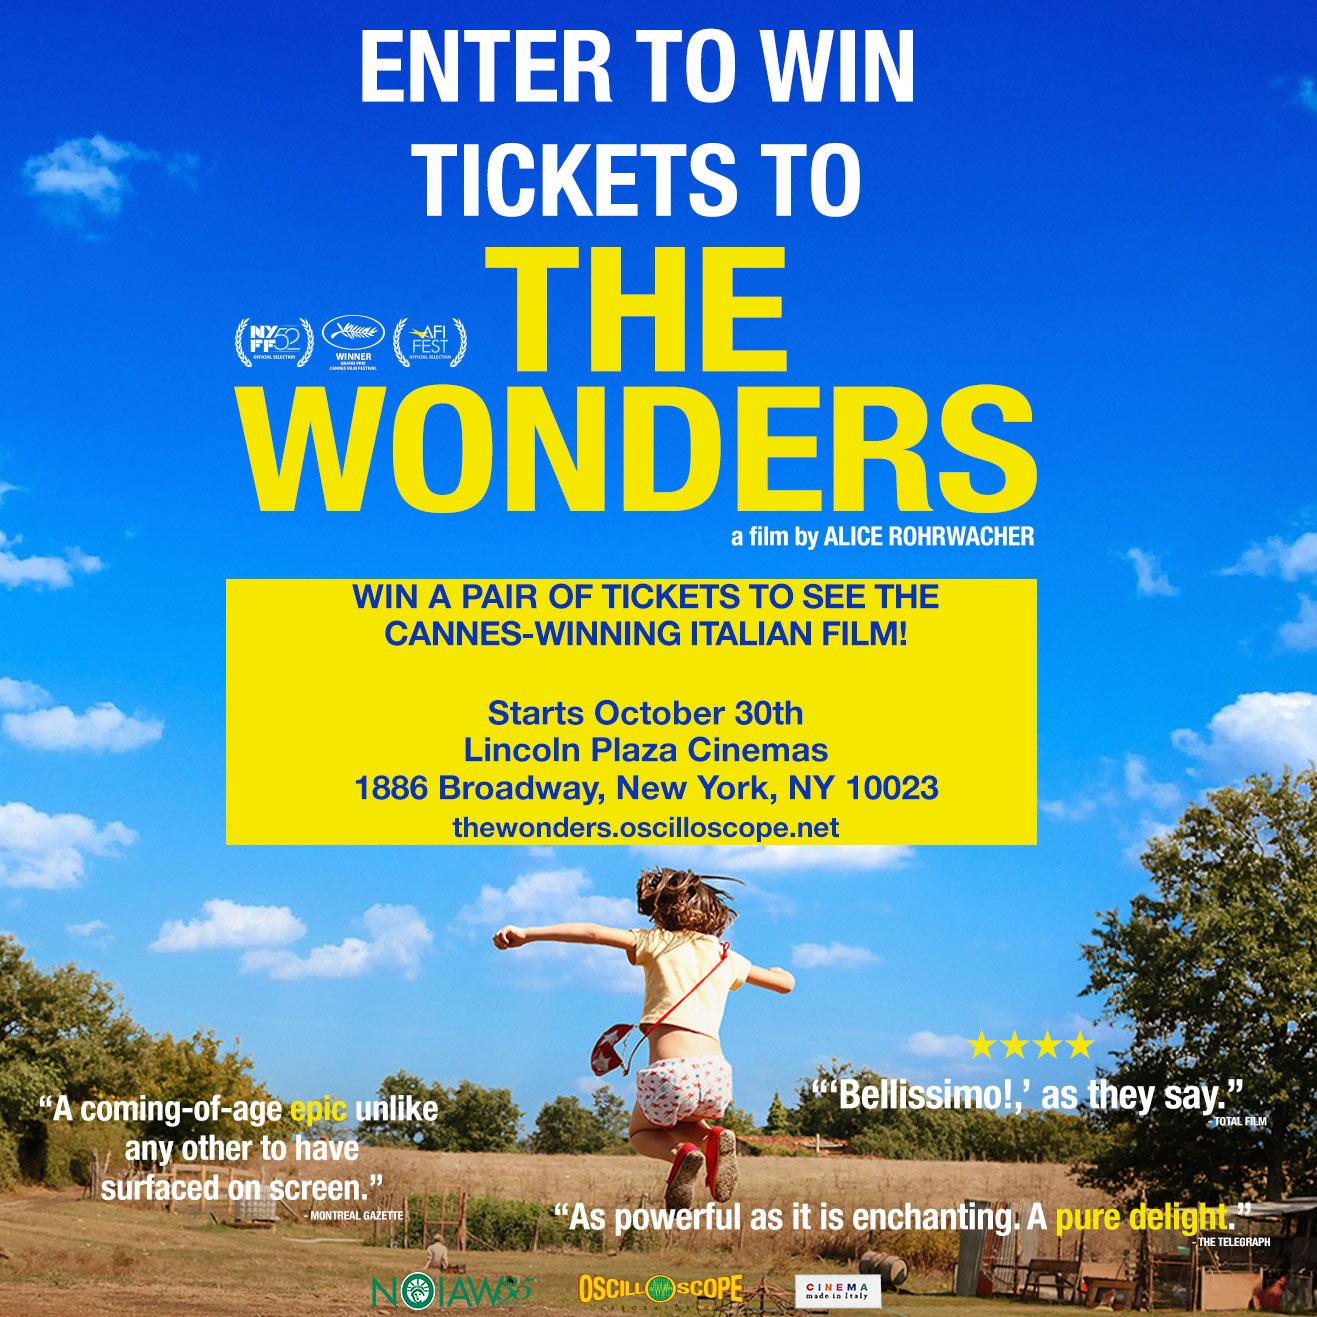 TheWonders_ticket_giveaway2